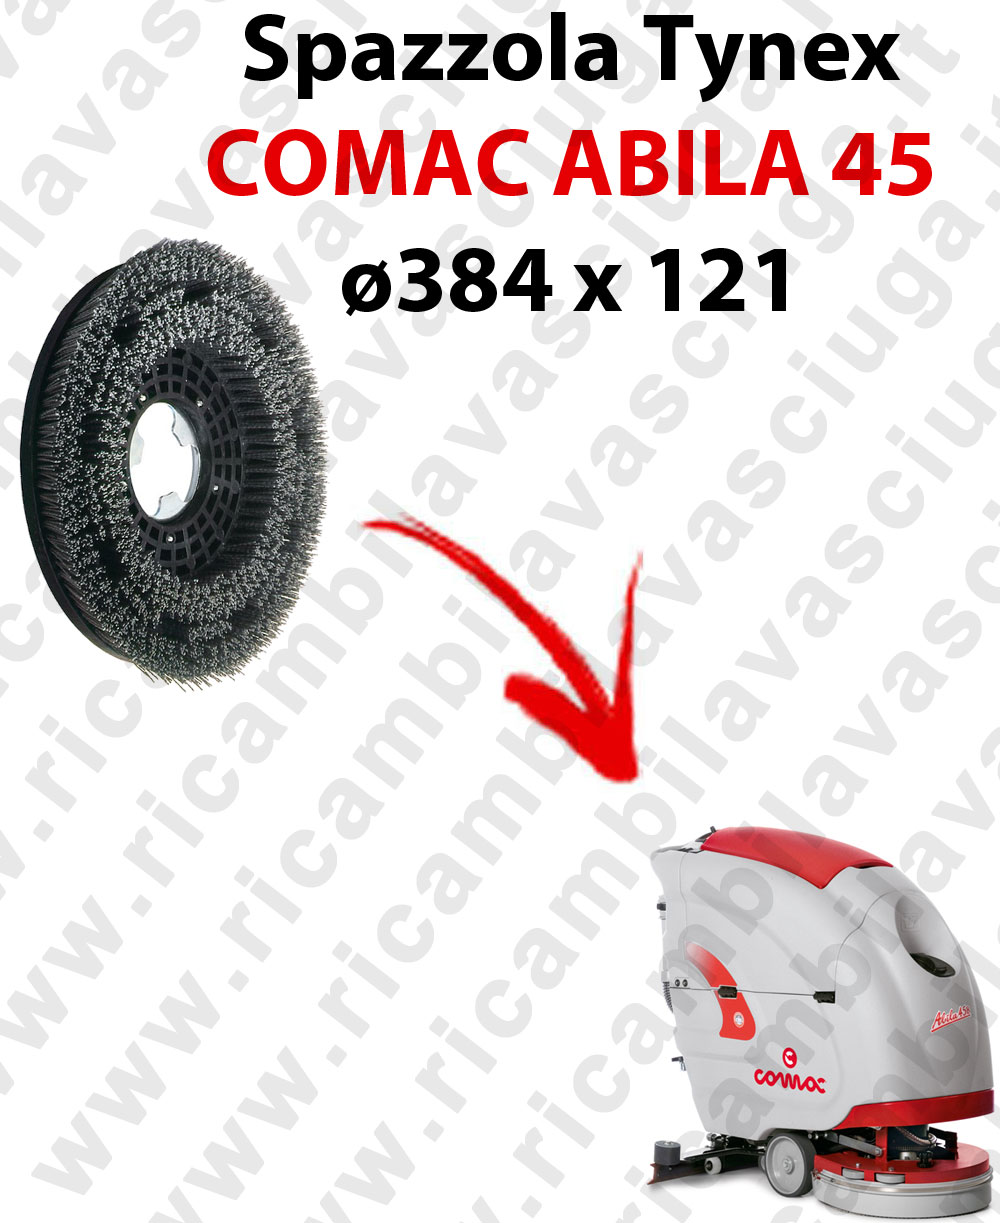 SPAZZOLA TYNEX  per lavapavimenti COMAC ABILA 45. Modello: tynex  ø384 X 121